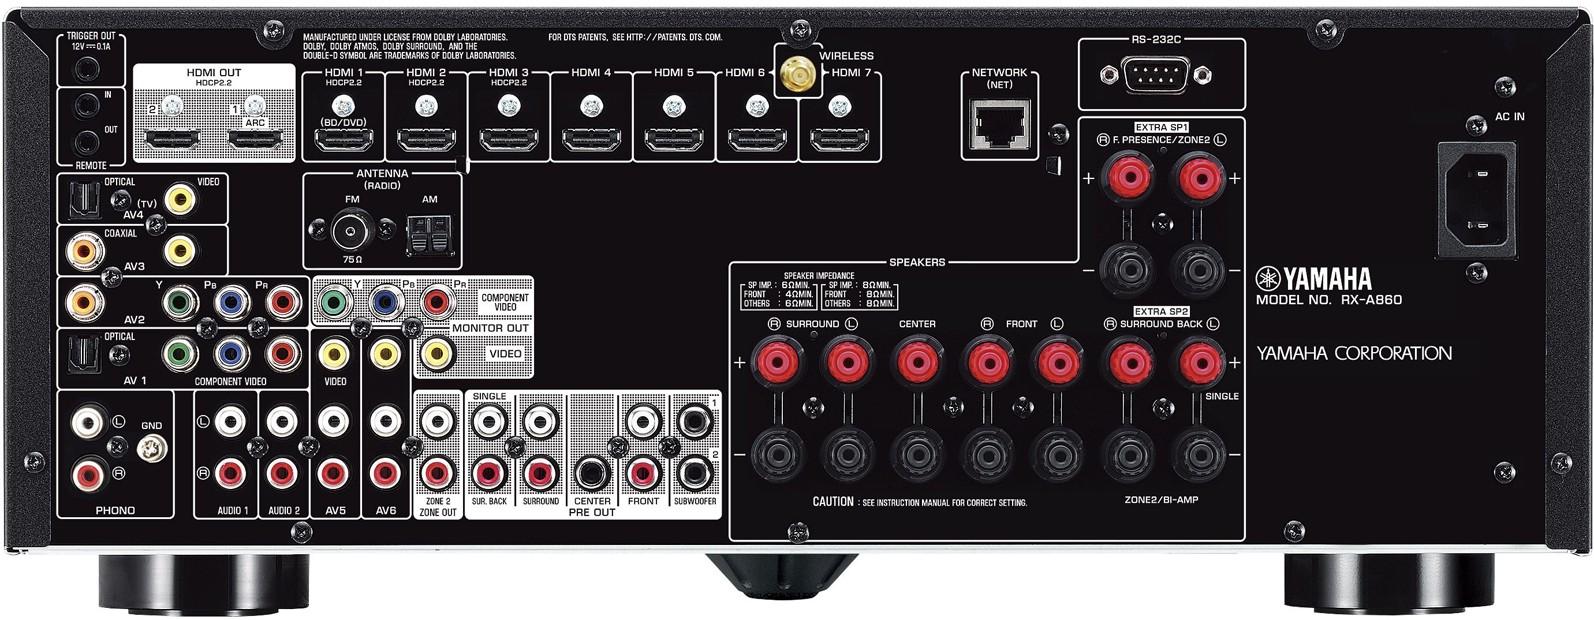 yamaha rx a860 7 2 channel aventage atmos av receiver